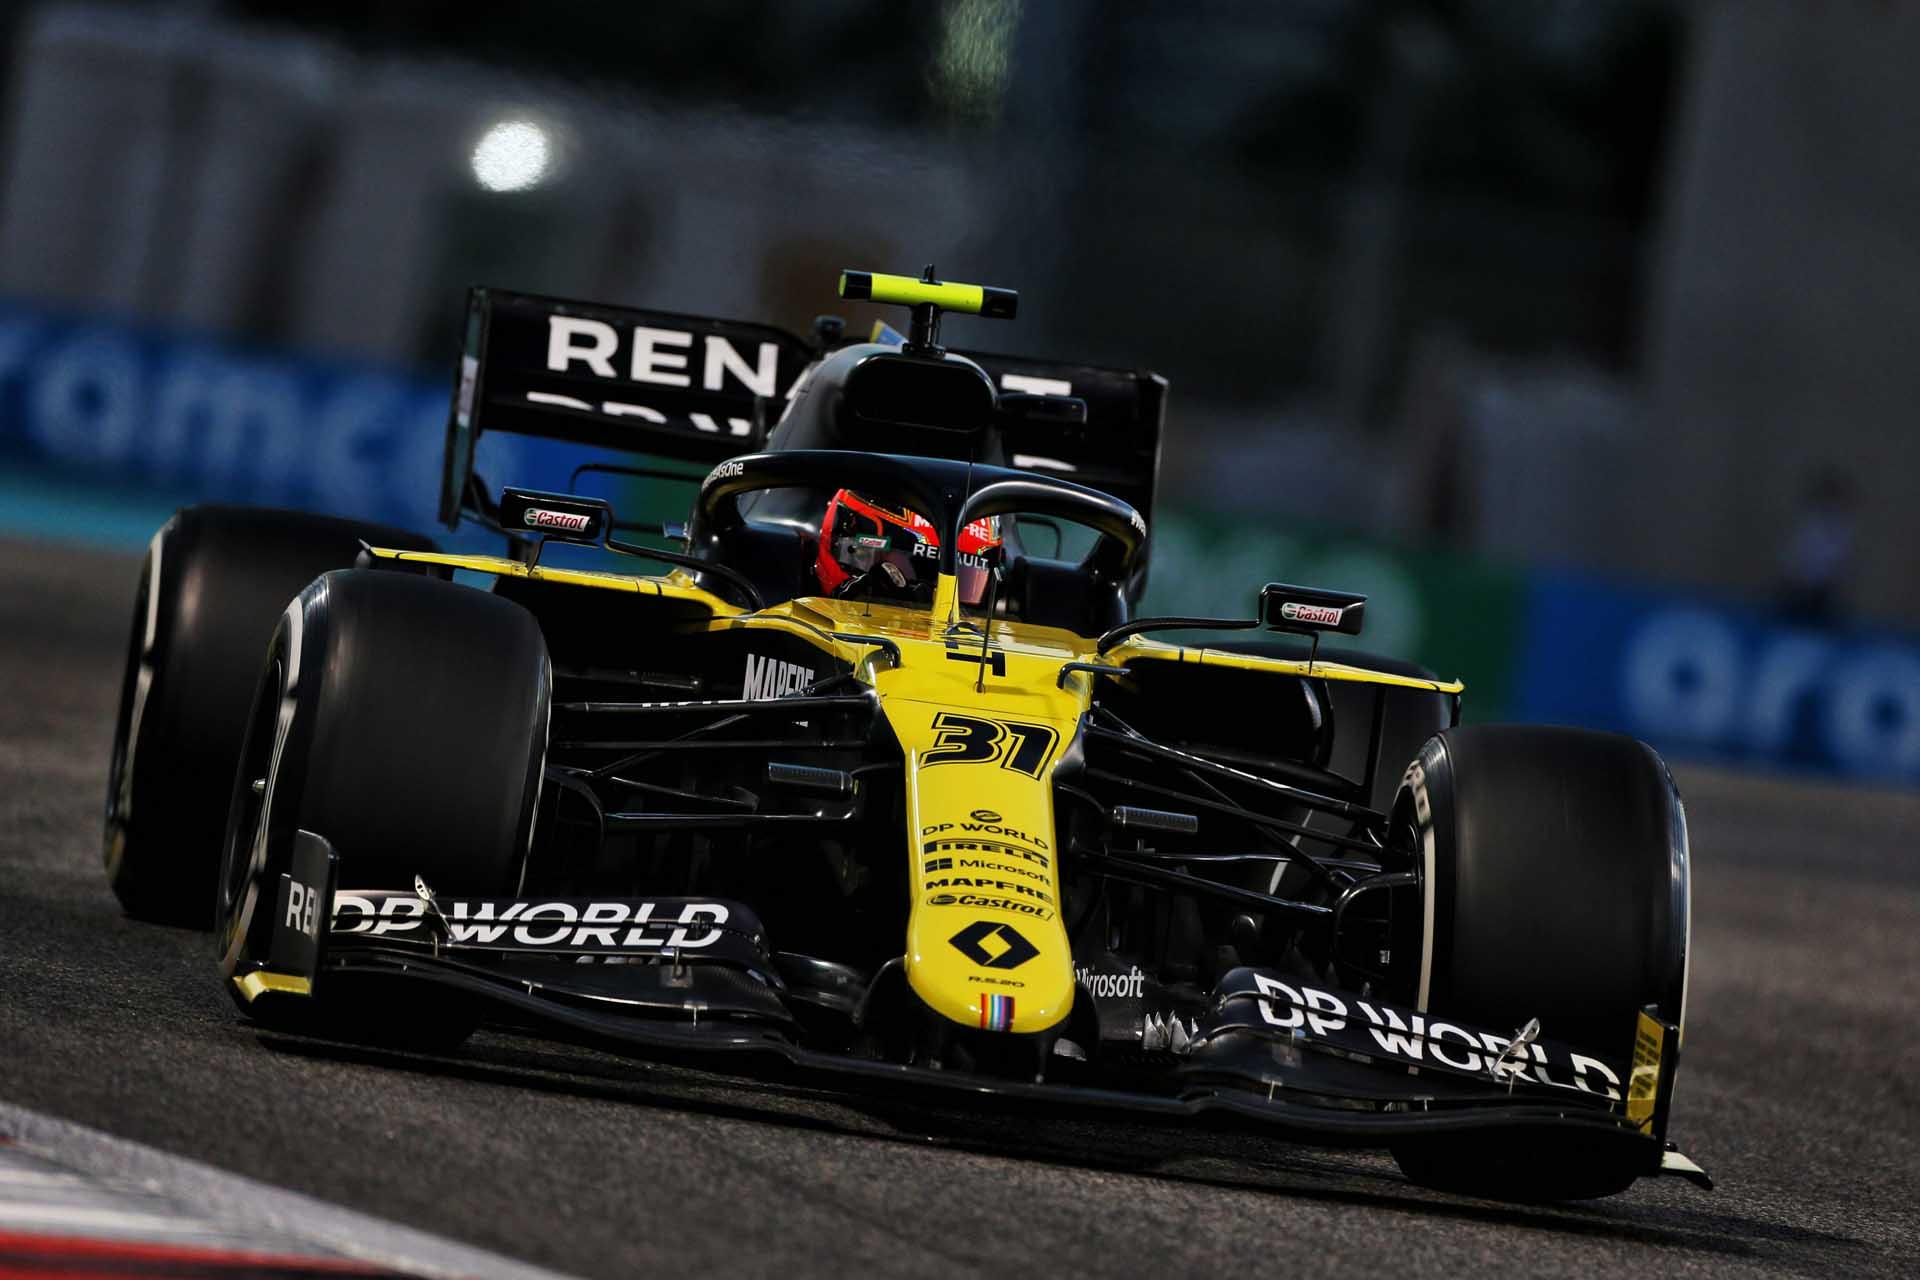 Motor Racing - Formula One World Championship - Abu Dhabi Grand Prix - Practice Day - Abu Dhabi, UAE